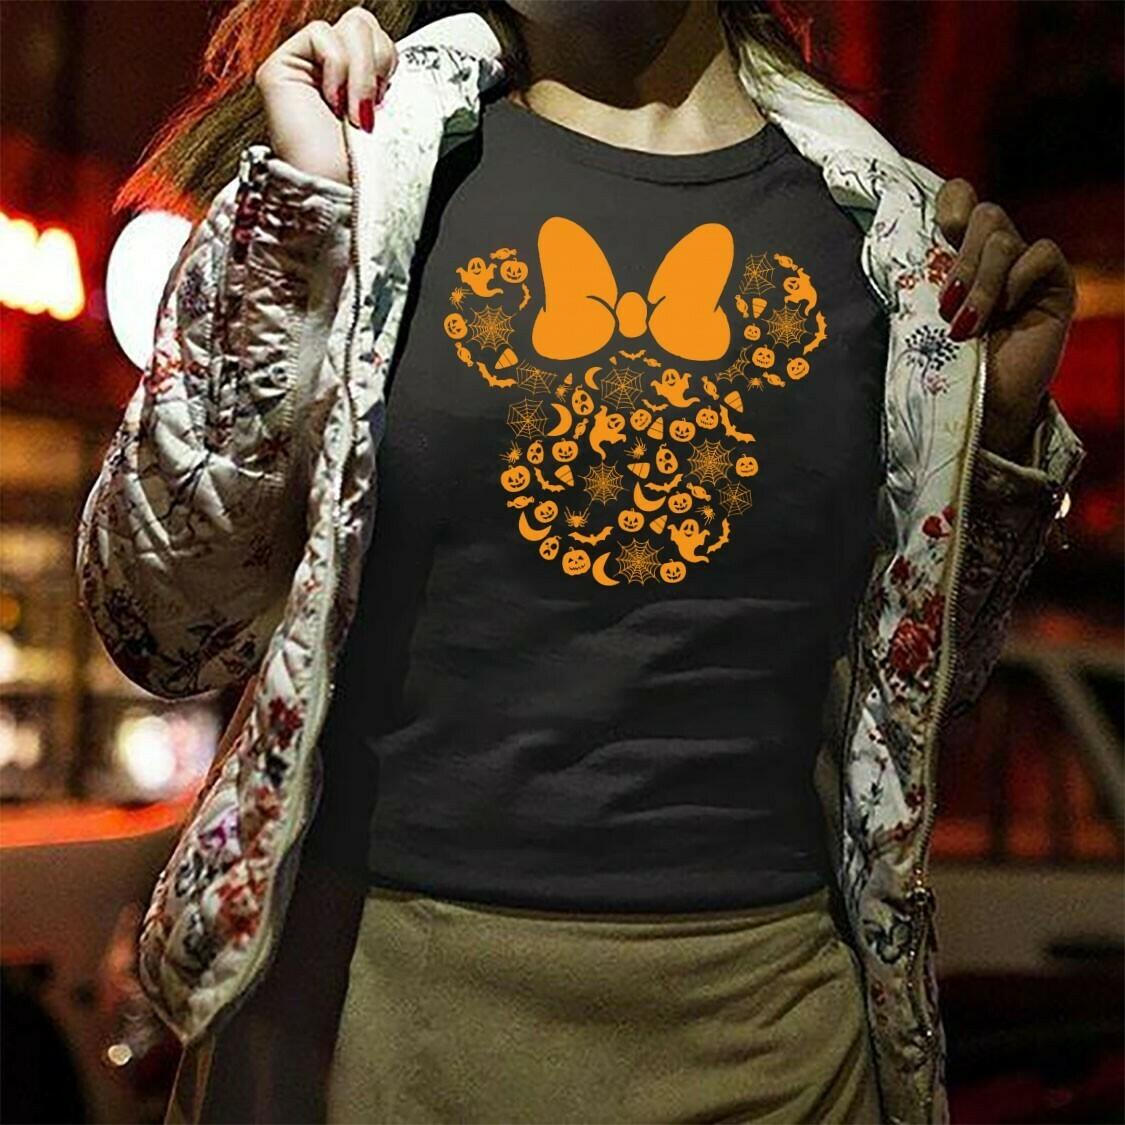 Disney Minnie Mouse Head Halloween Pumpkin Boo Bat Let's Go to Disney World Disneyland Tee Park T Shirt Long Sleeve Sweatshirt Hoodie Jolly Family Gifts